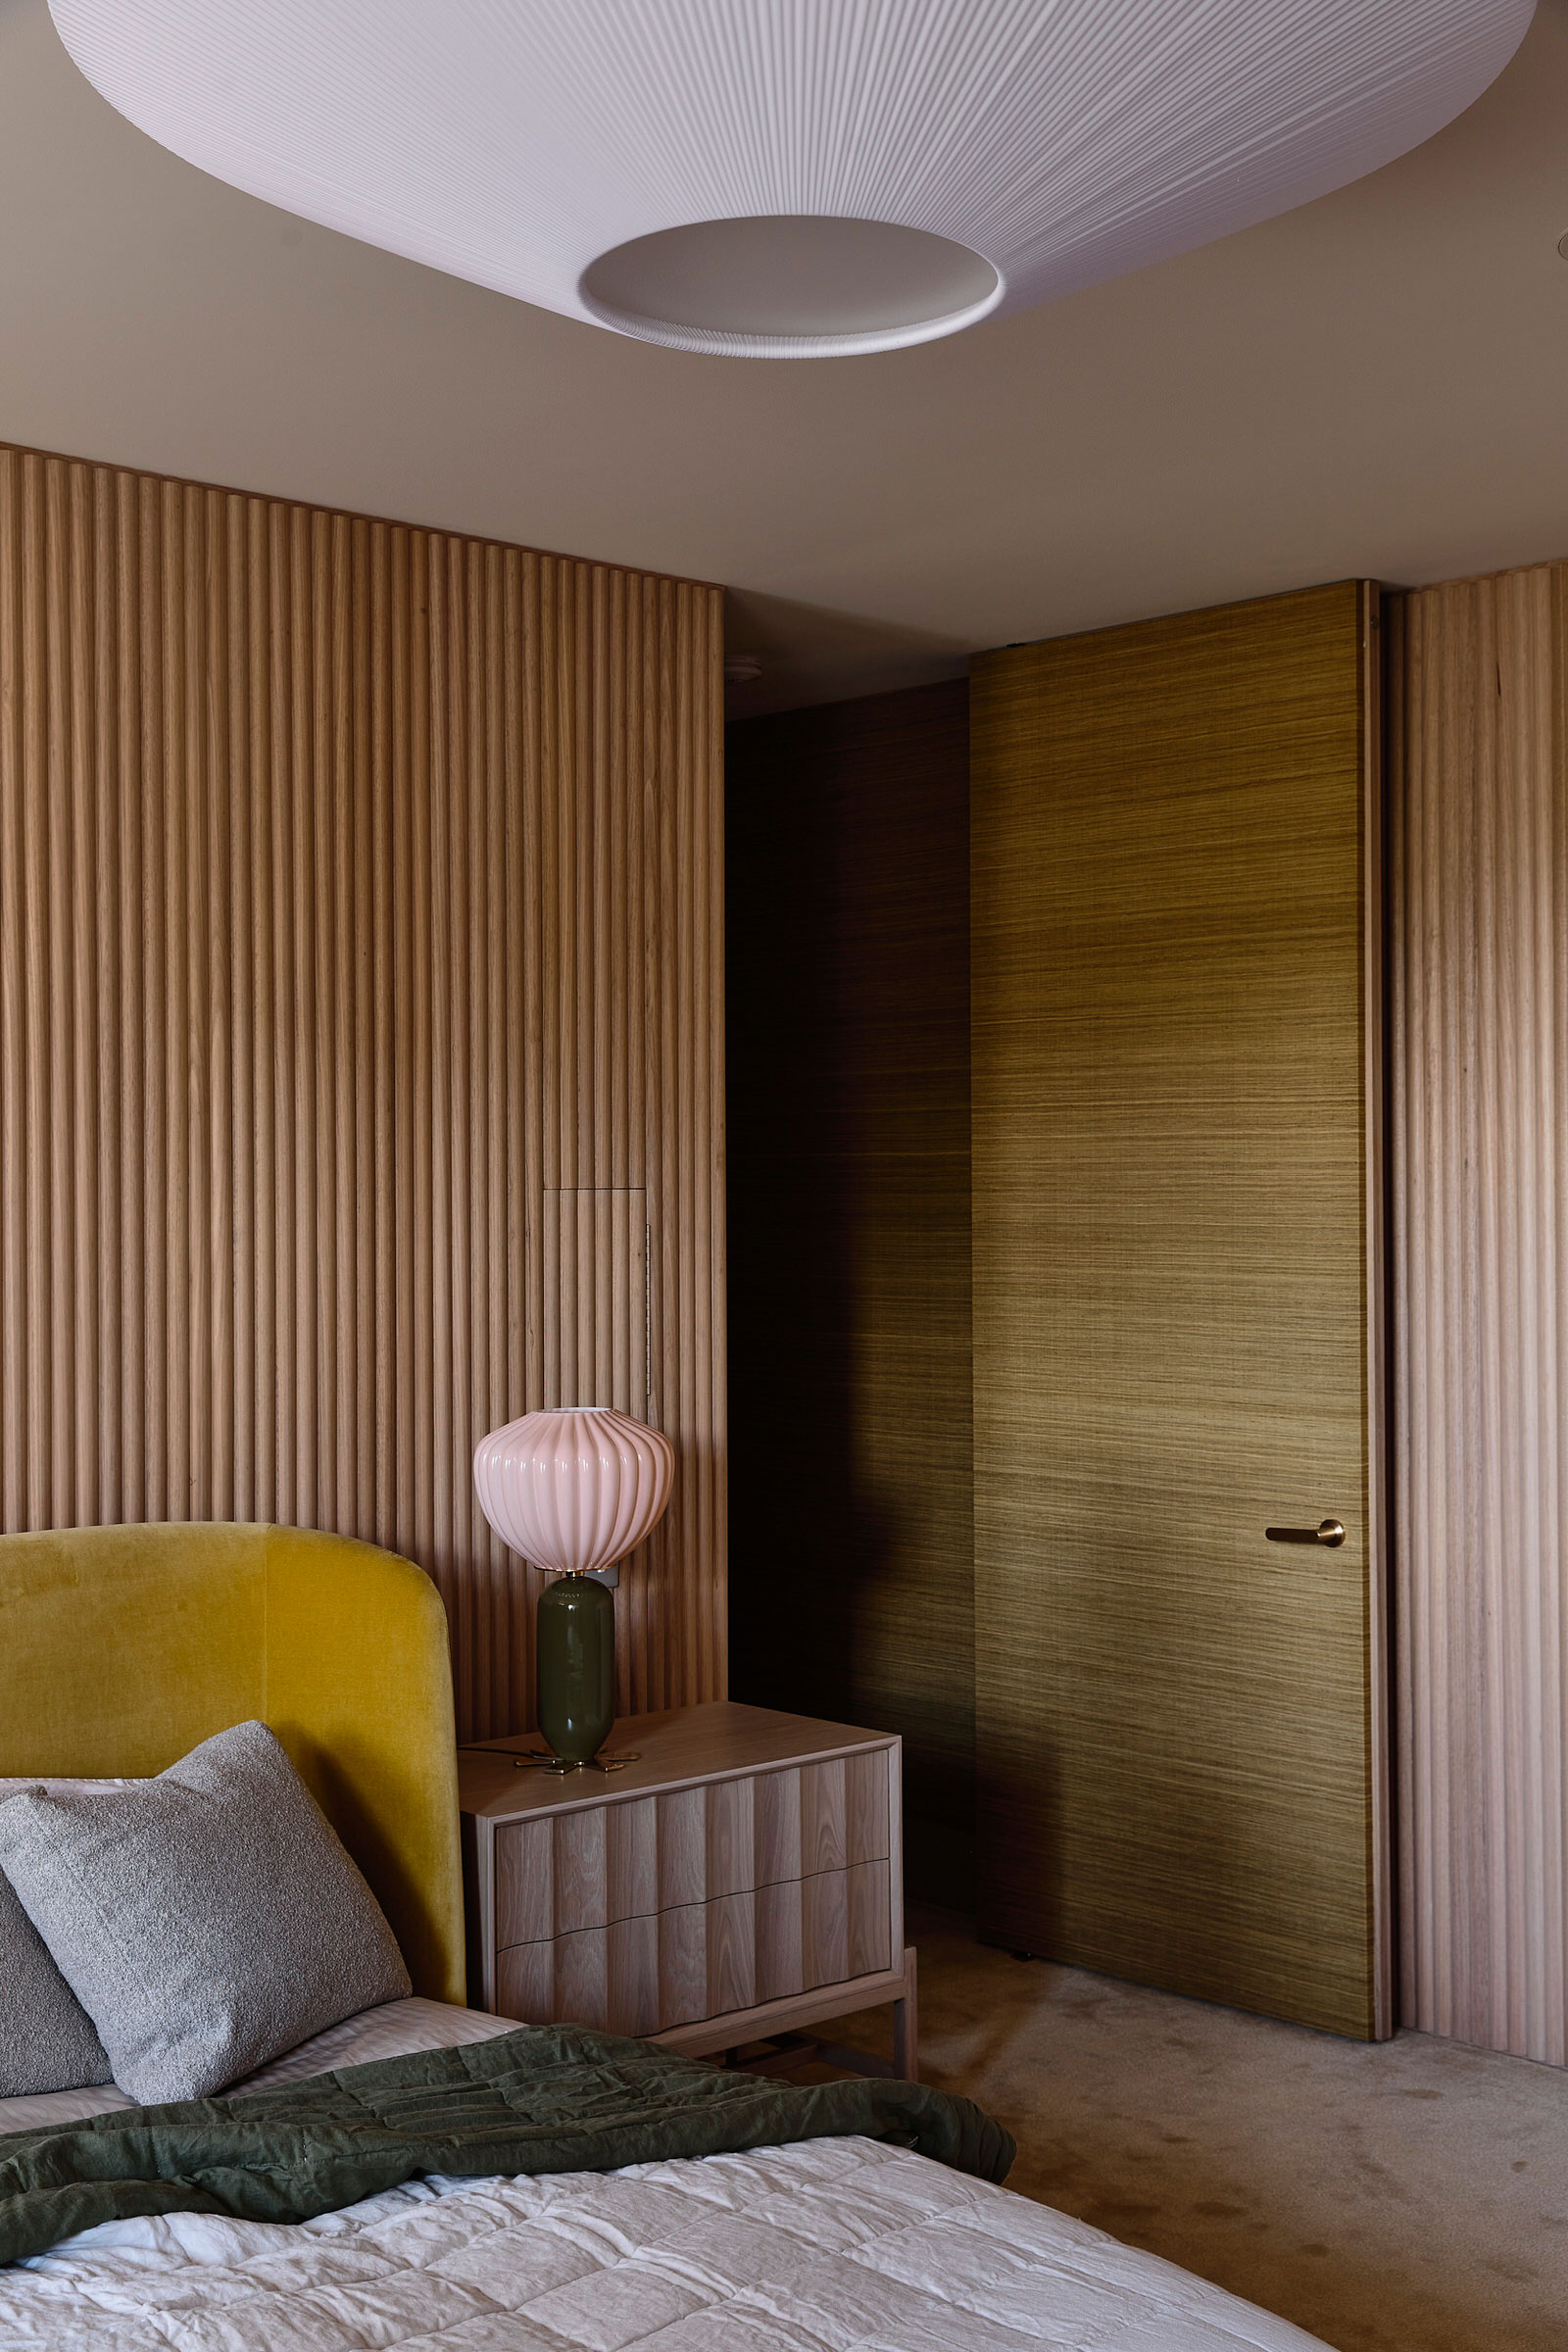 Kennedy Nolan Elsternwick House Melbourne Residential Architecture Photo Derek Swalwell Yellowtrace 21